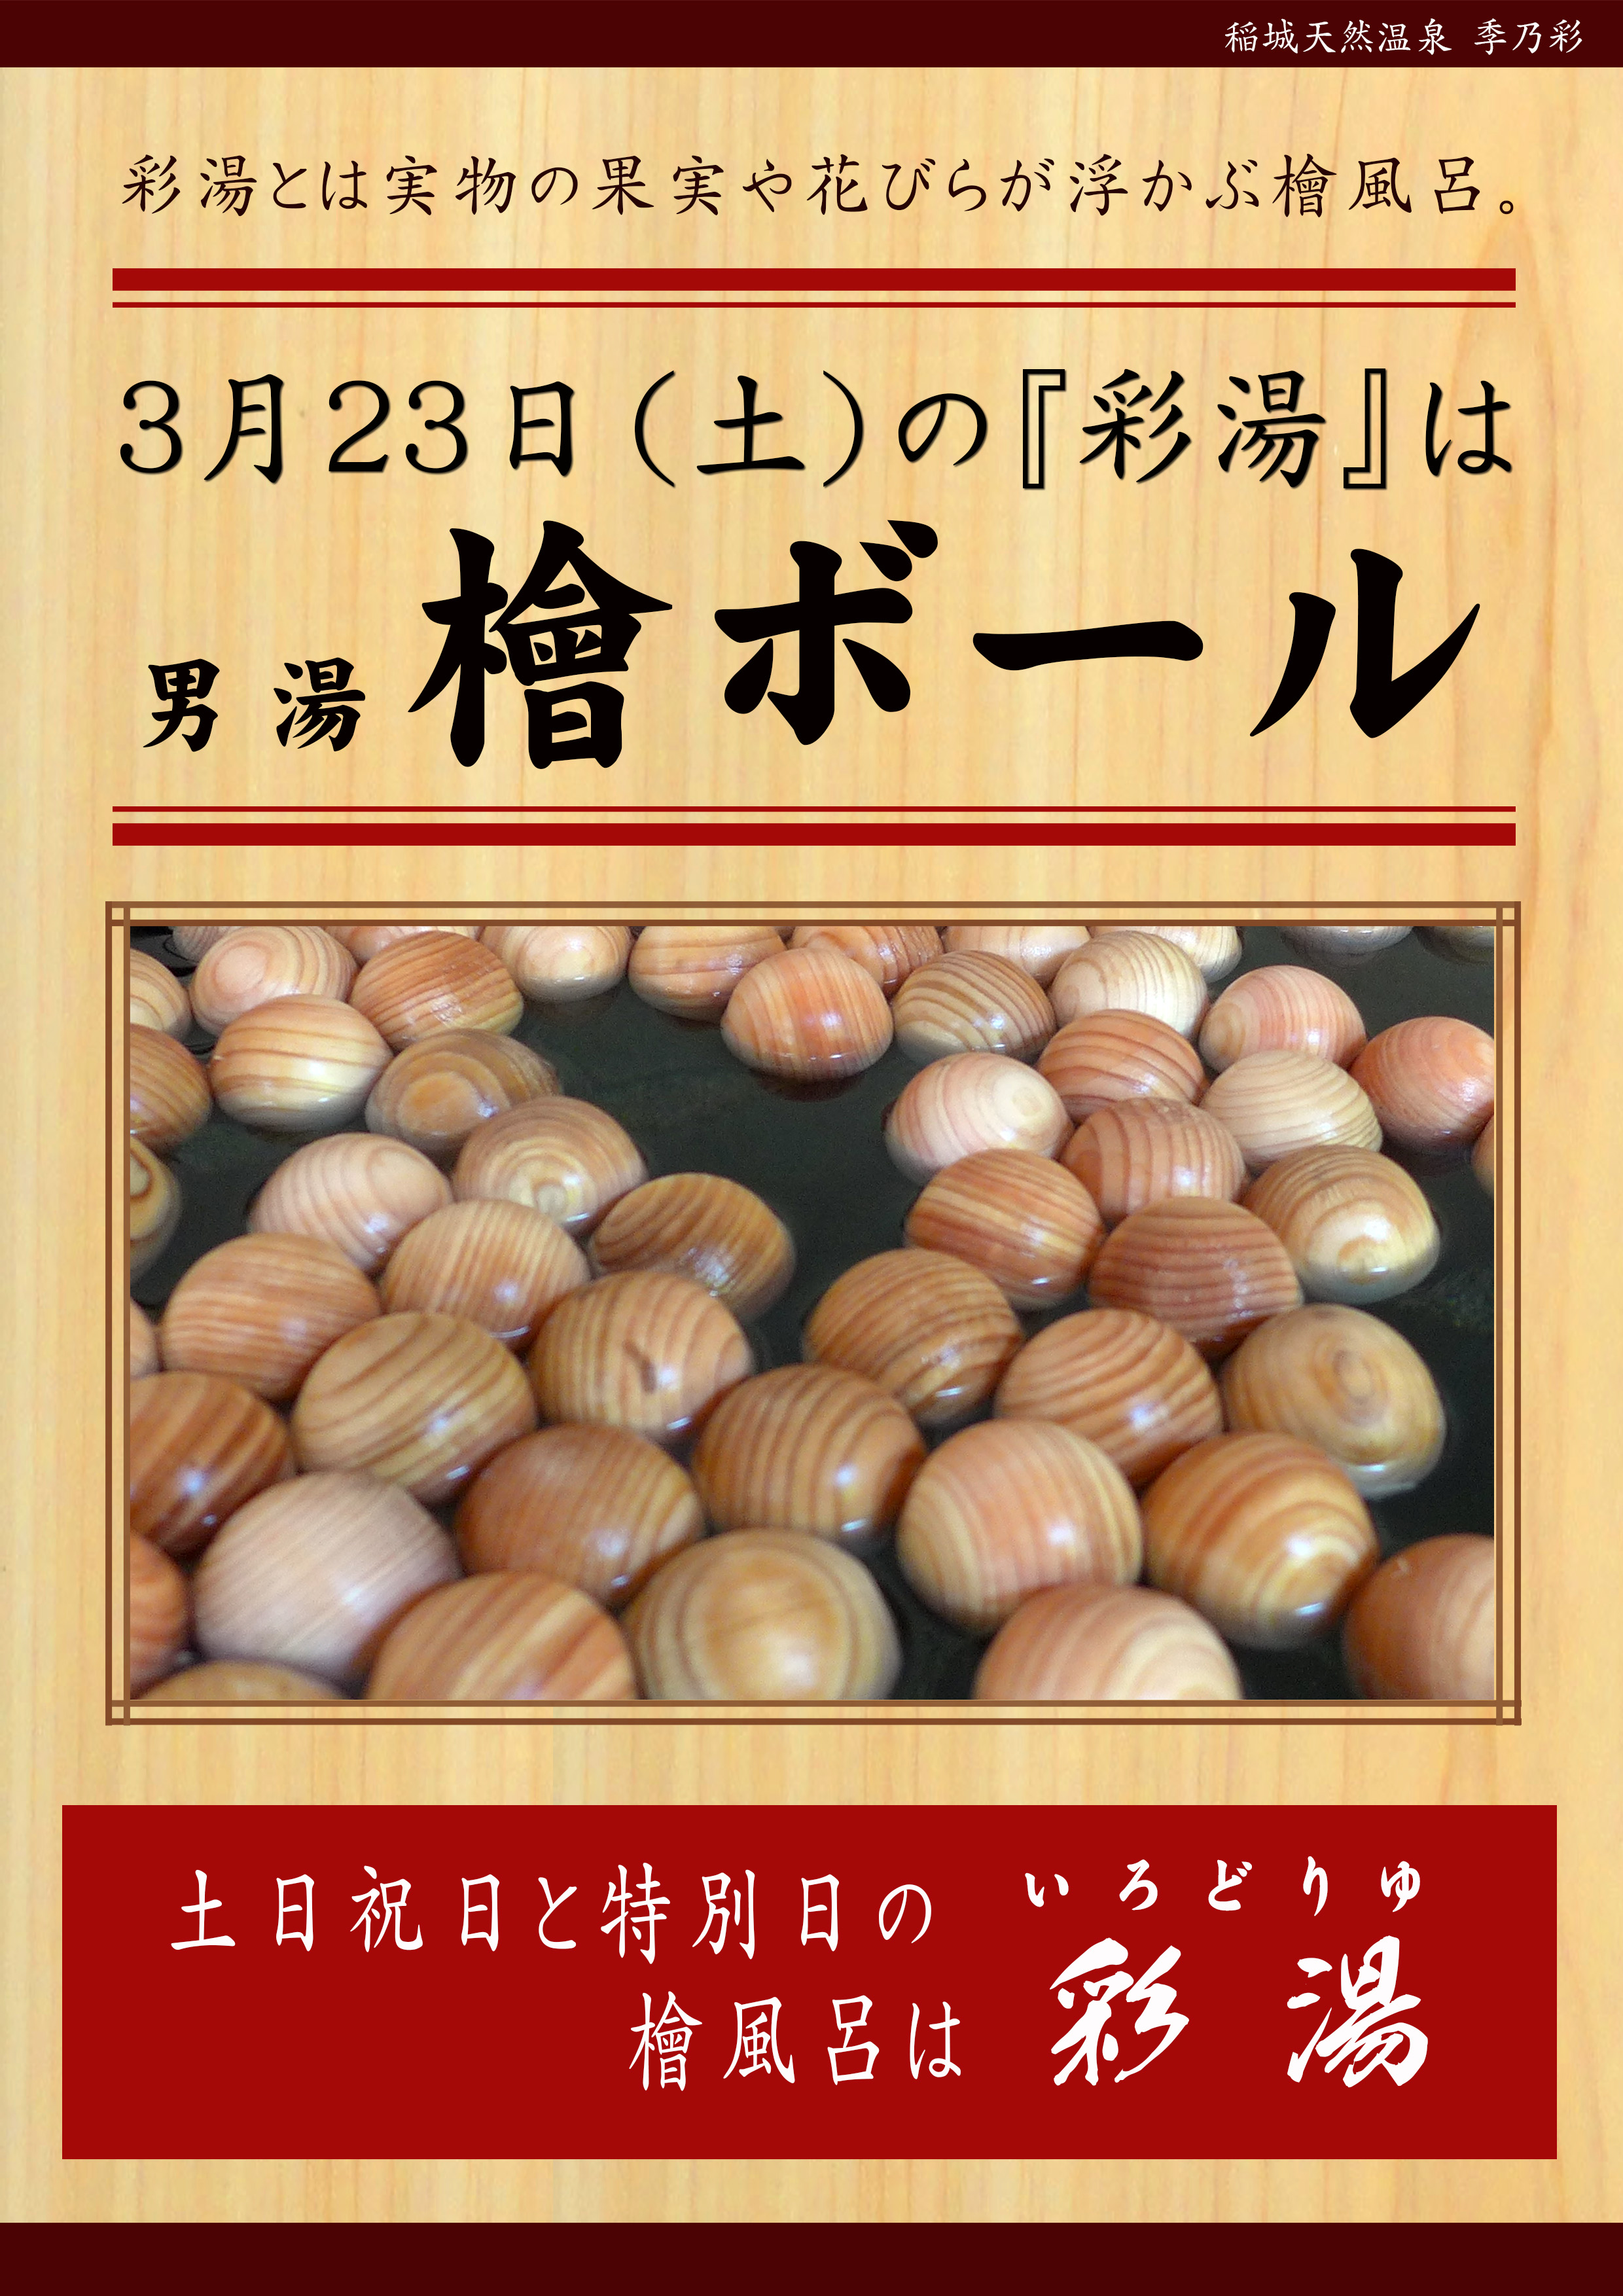 20190323POP イベント 彩湯 男湯 檜ボール